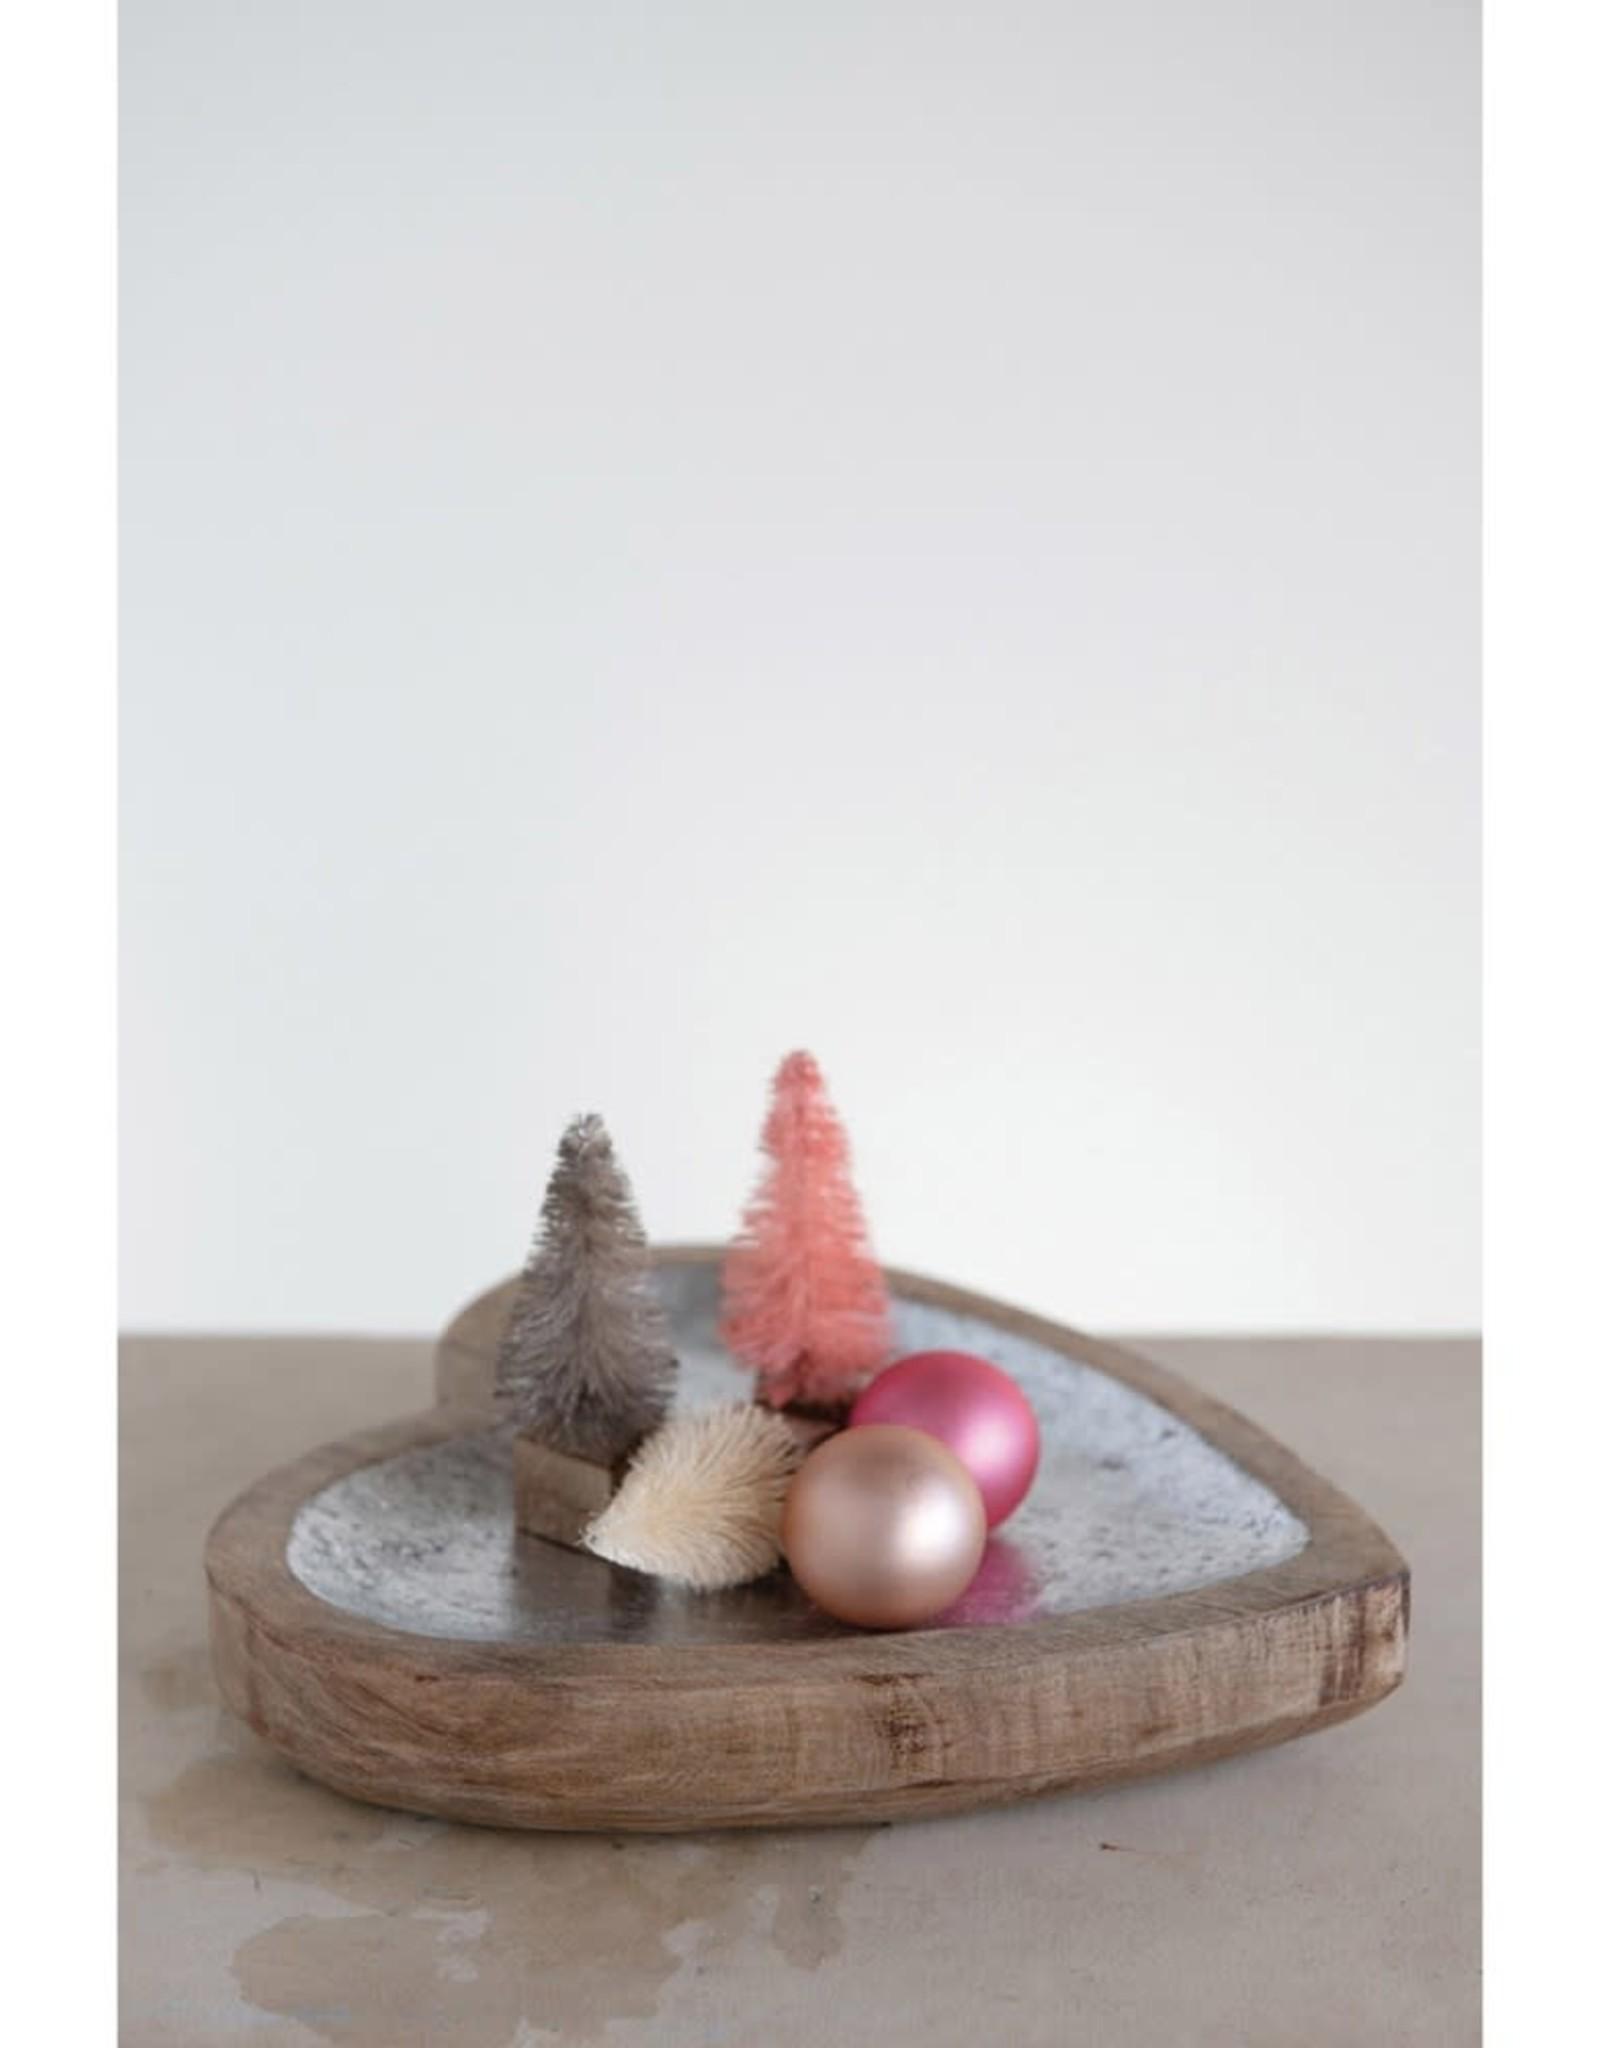 Creative Co-Op Silver Finish Wood Heart Tray